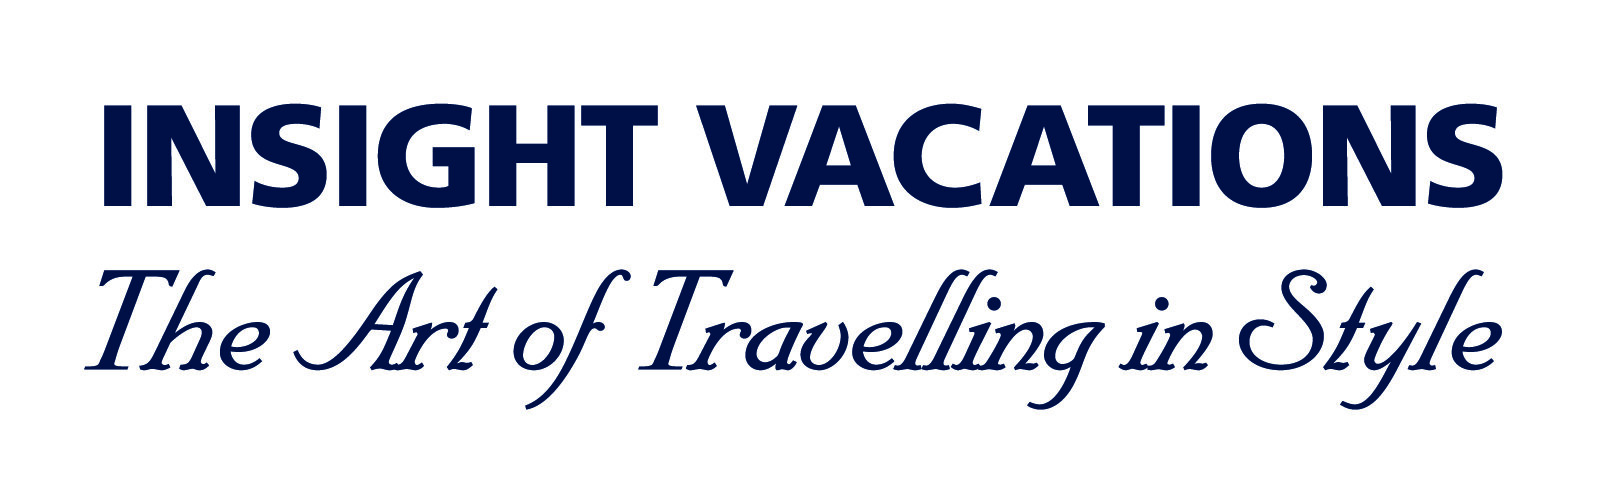 insight vacation